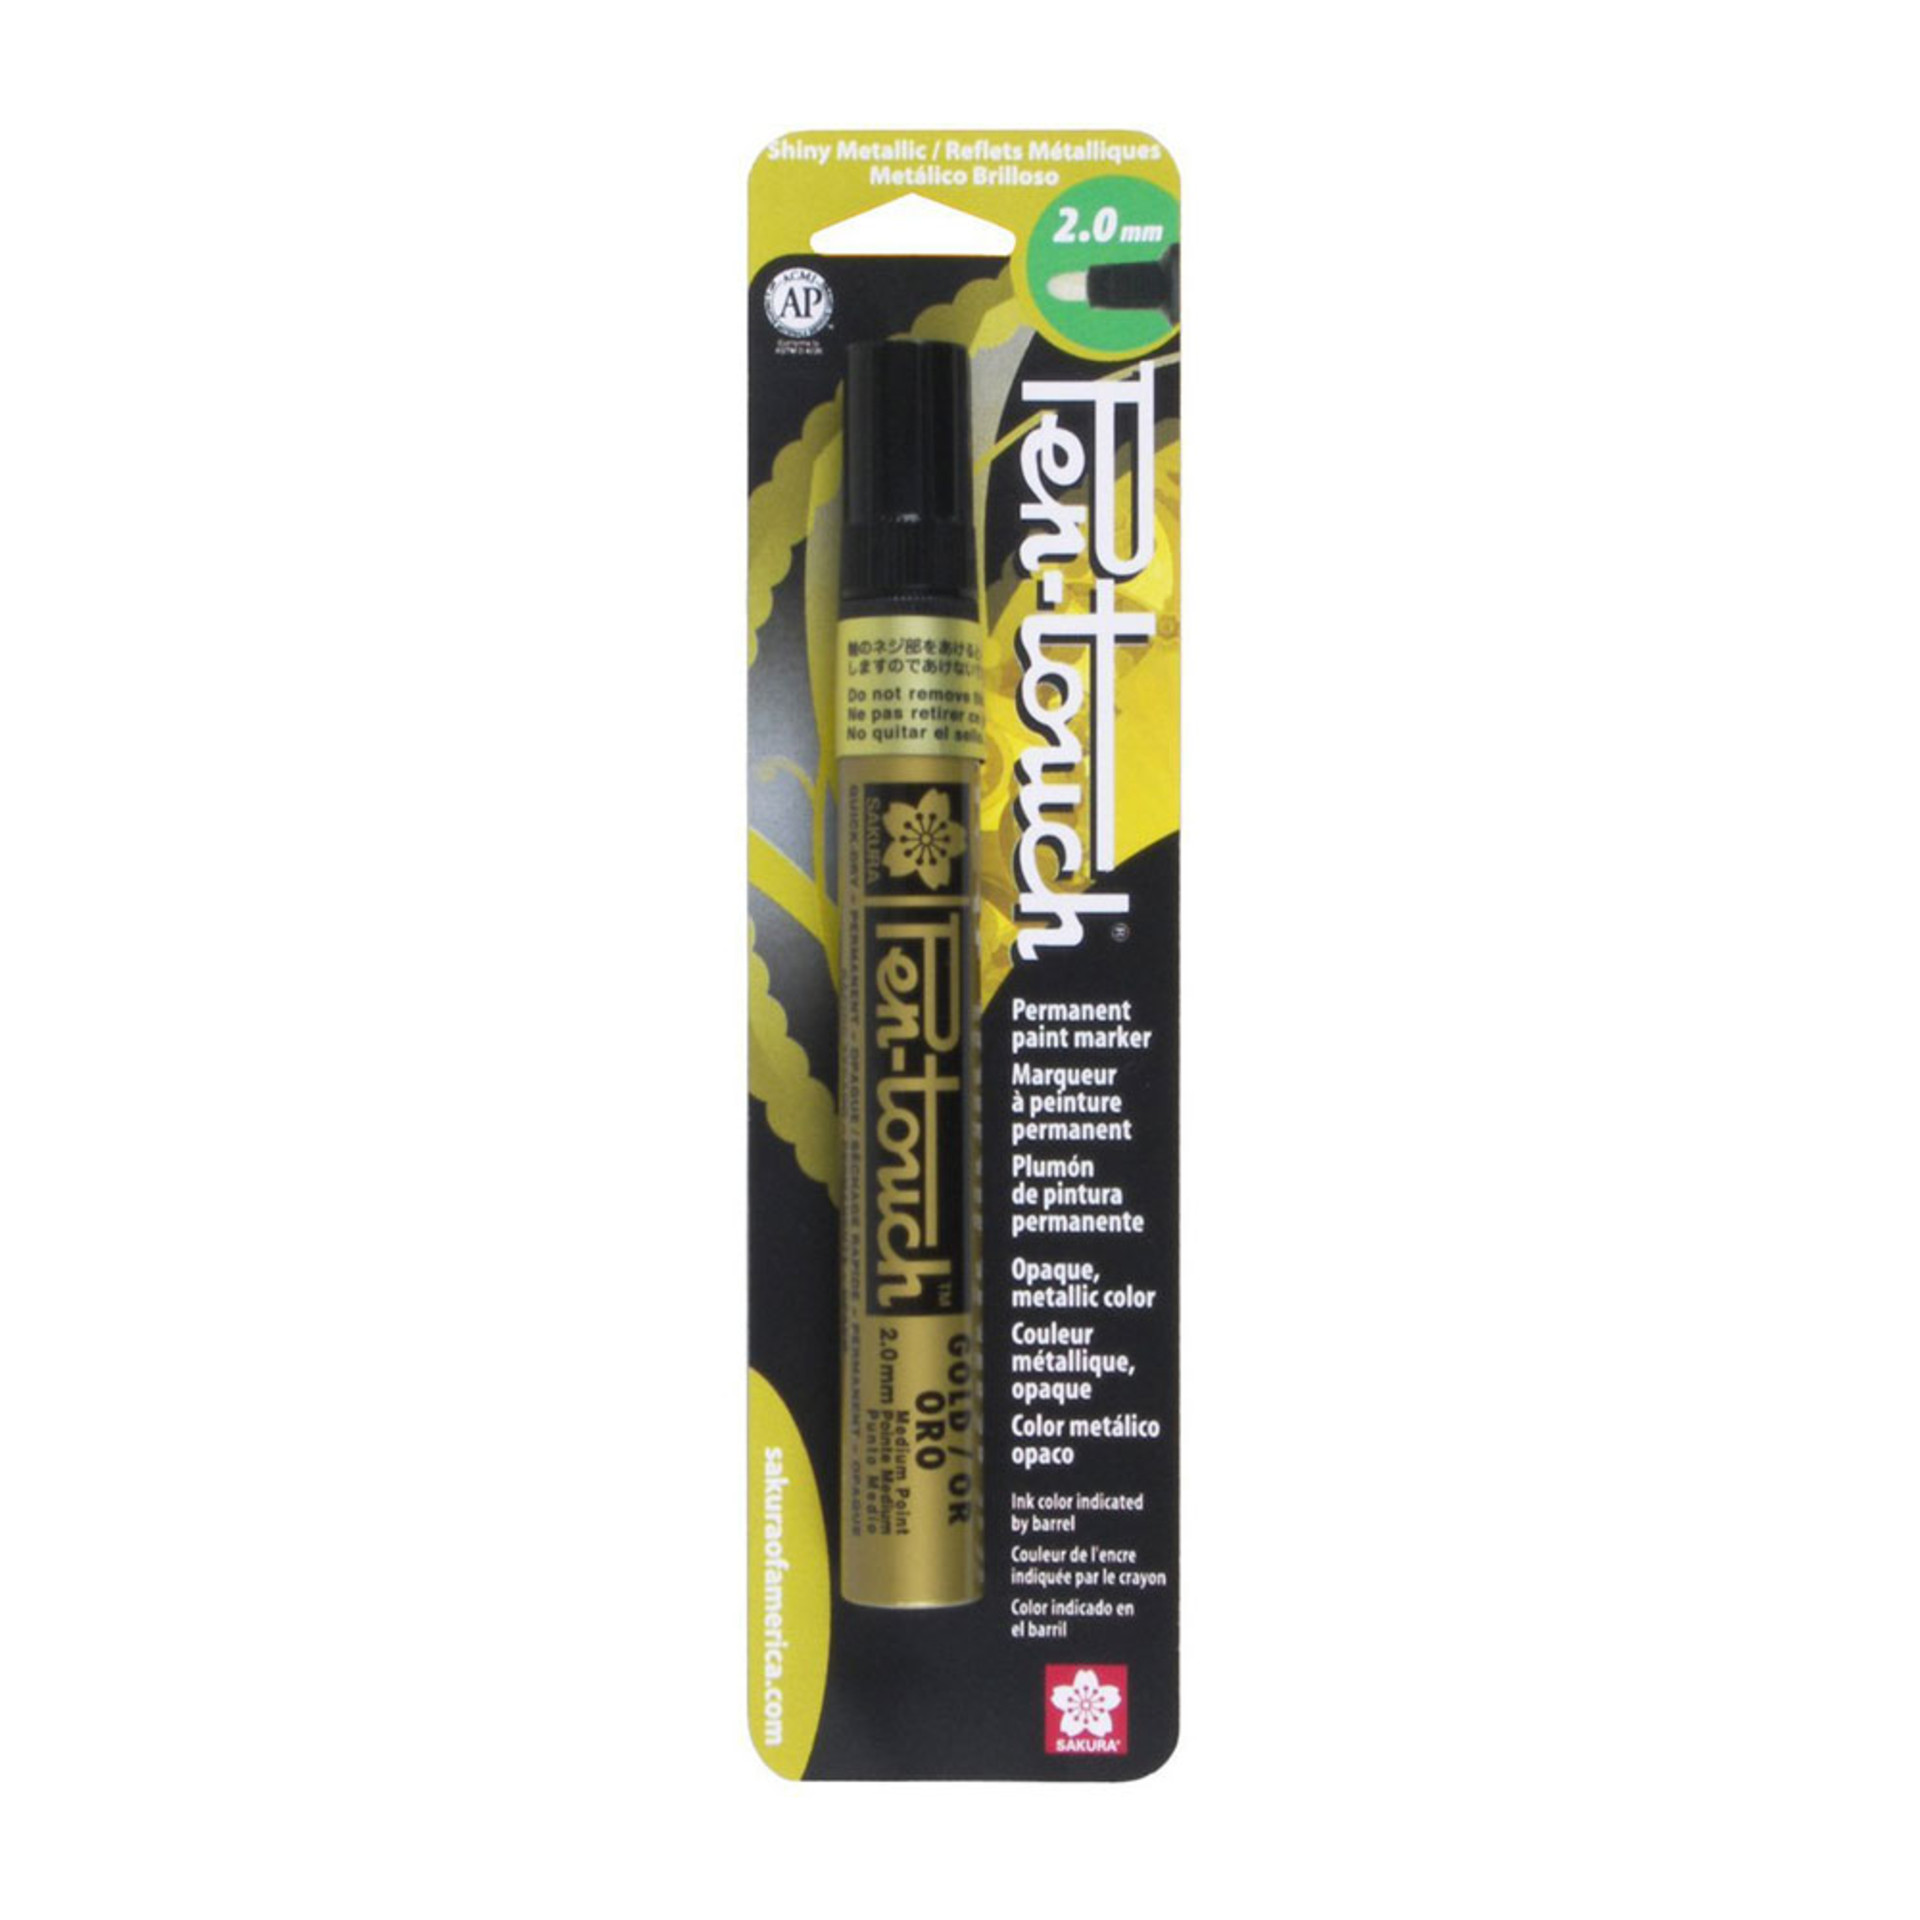 Sakura Pen-Touch Permanent Paint Marker – Gold 2.0 Millimeters